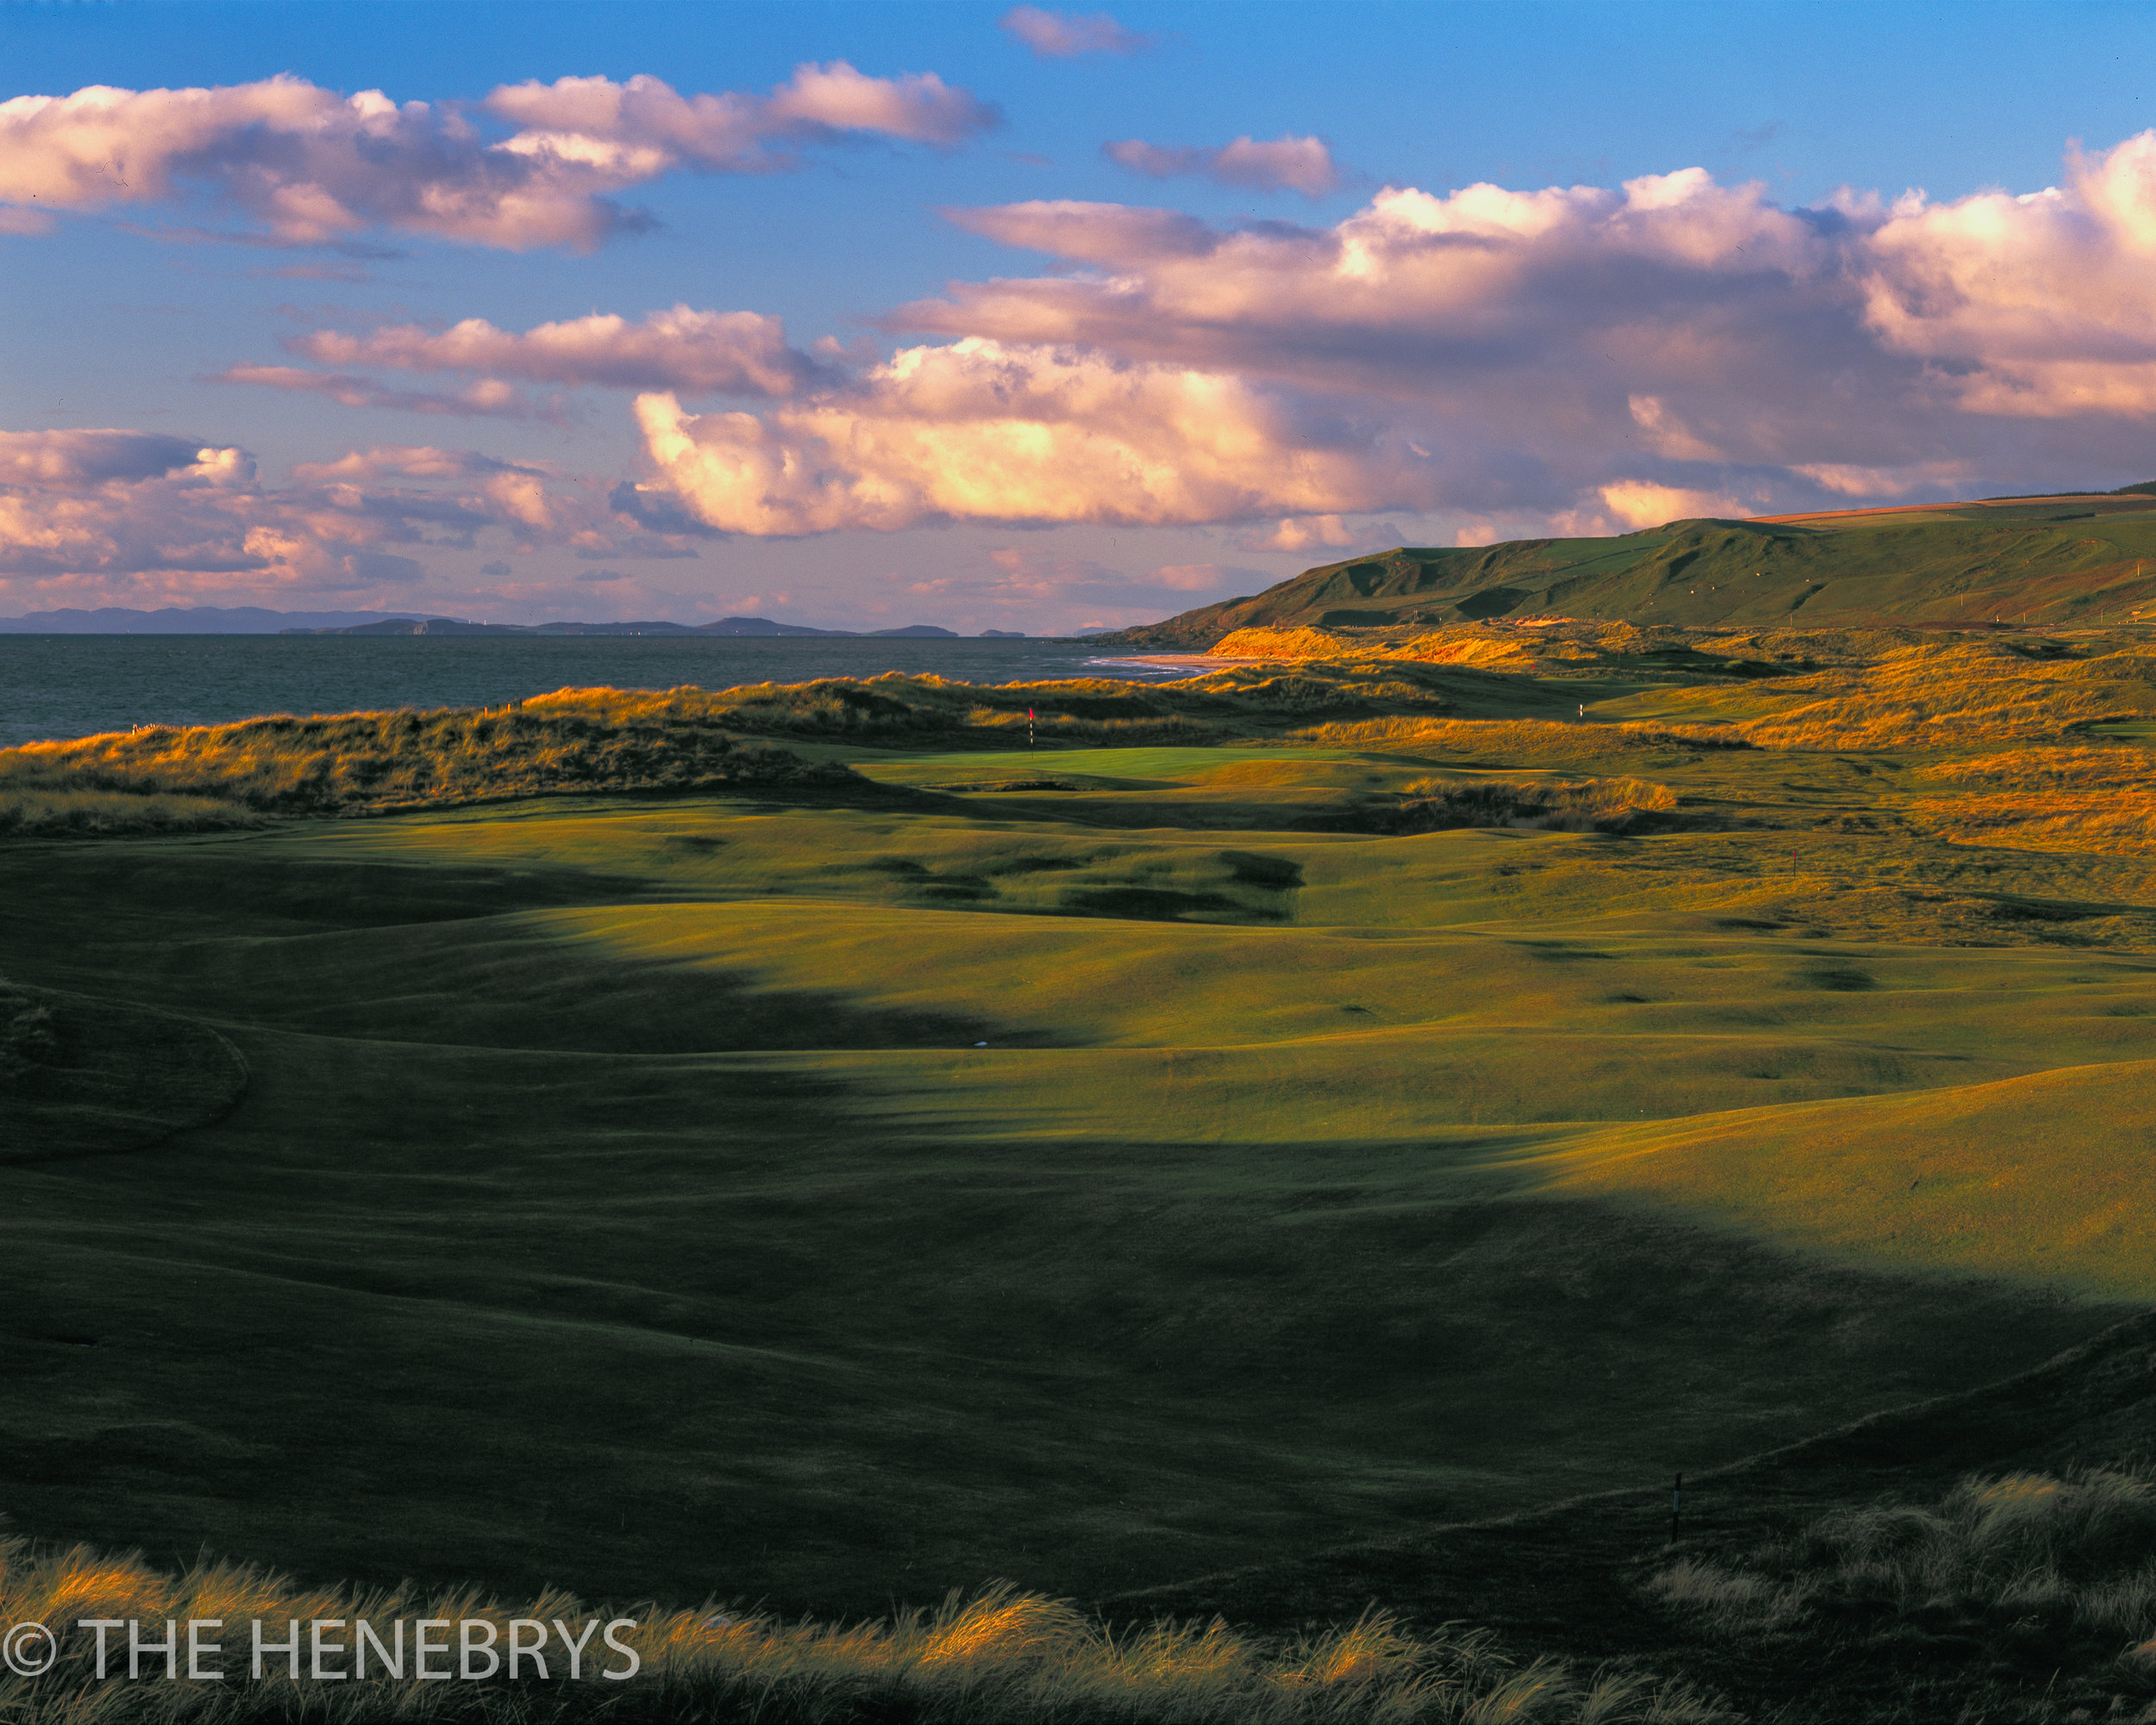 Machrihanish Dunes Golf Club #15, Campbeltown, Scotland